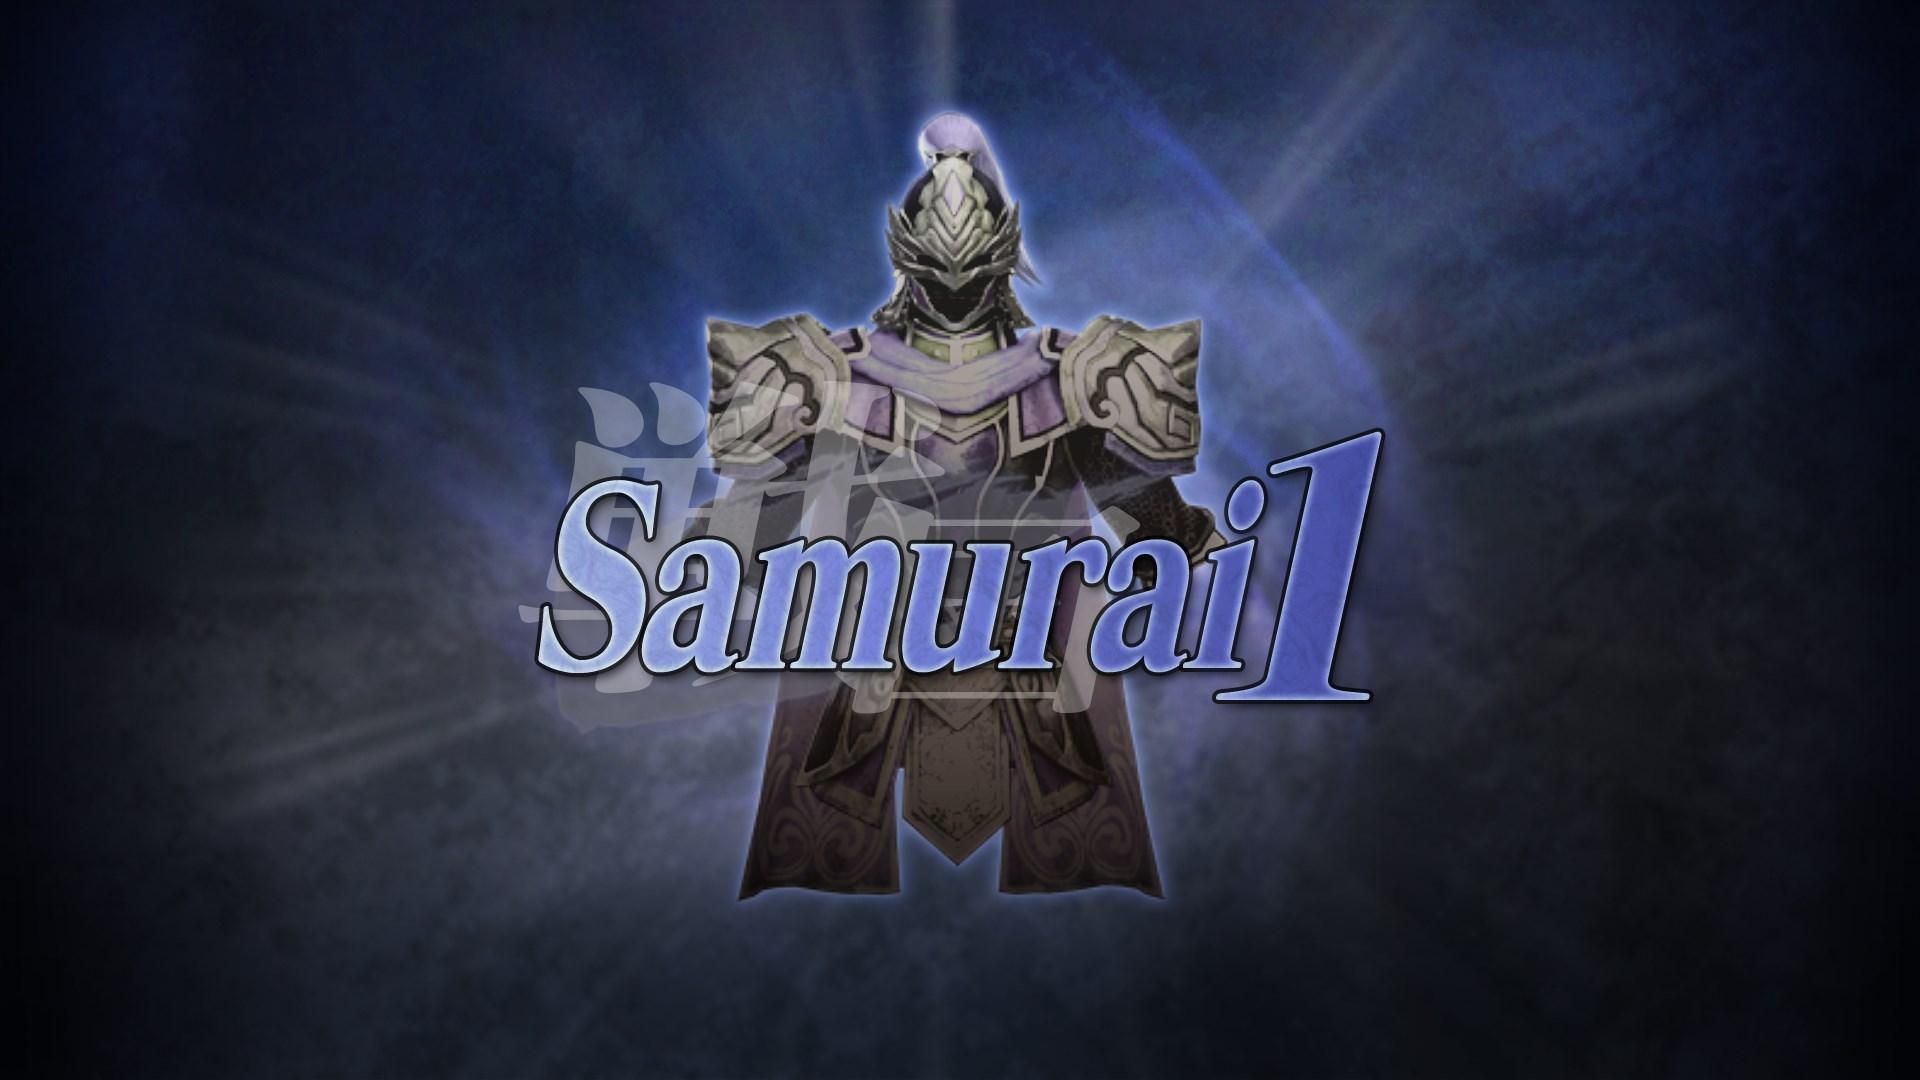 WARRIORS OROCHI 3 Ultimate SAMURAI DRESS UP COSTUME 1